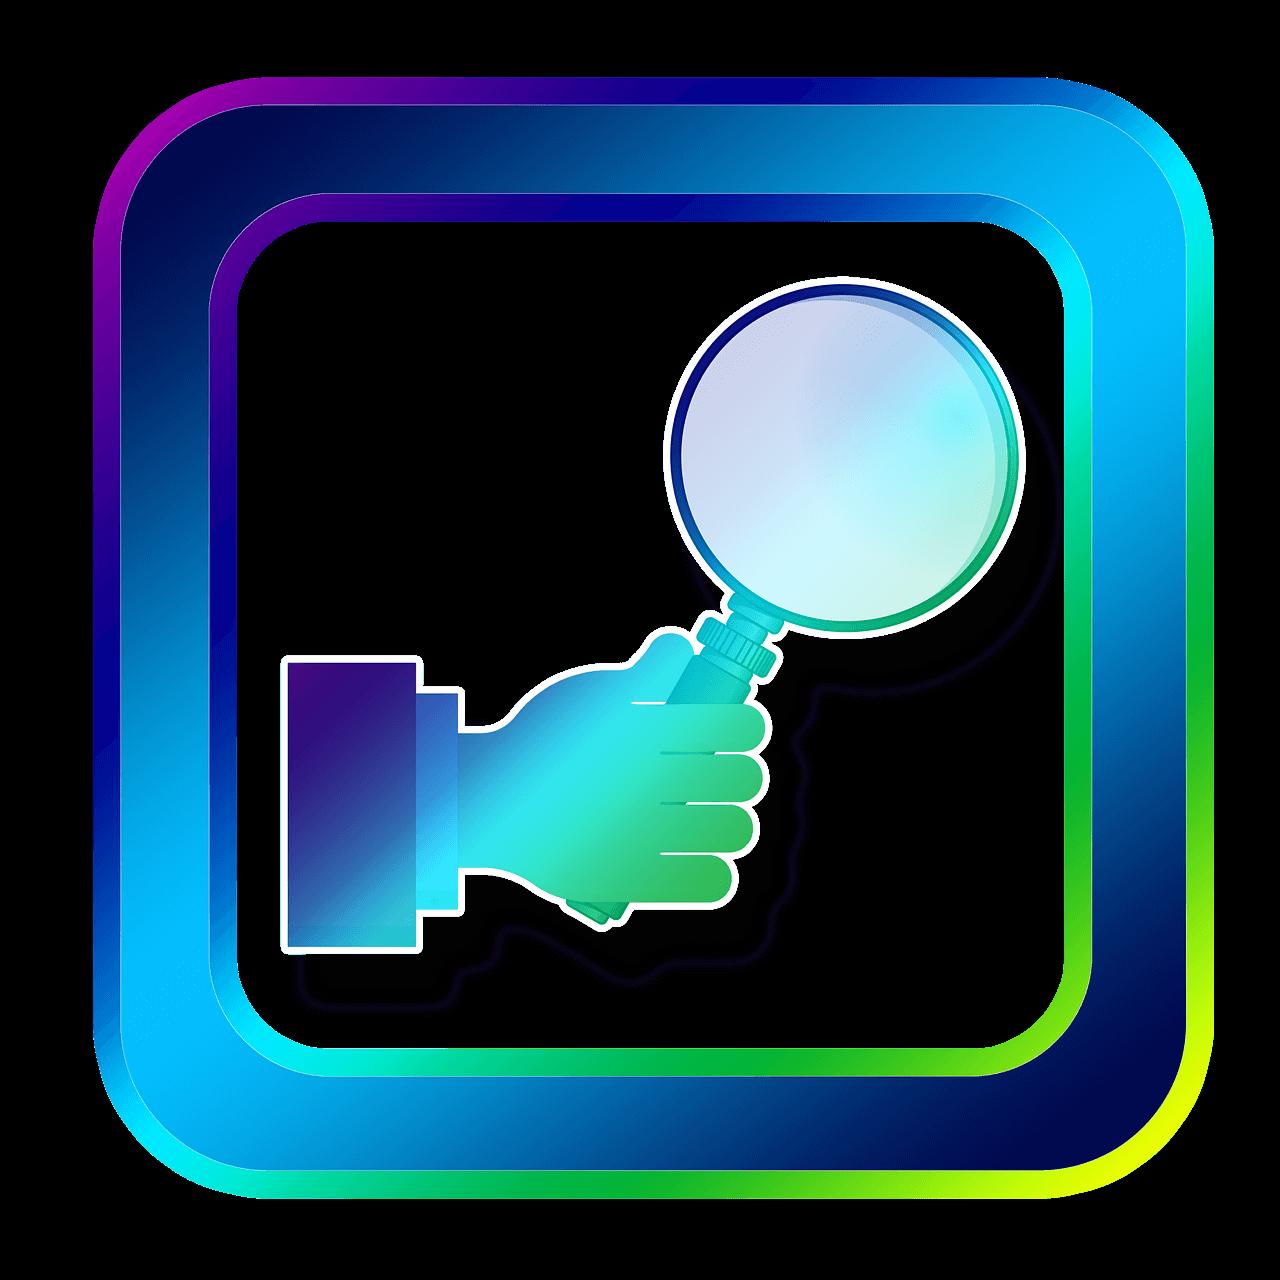 icon-1691325_1280